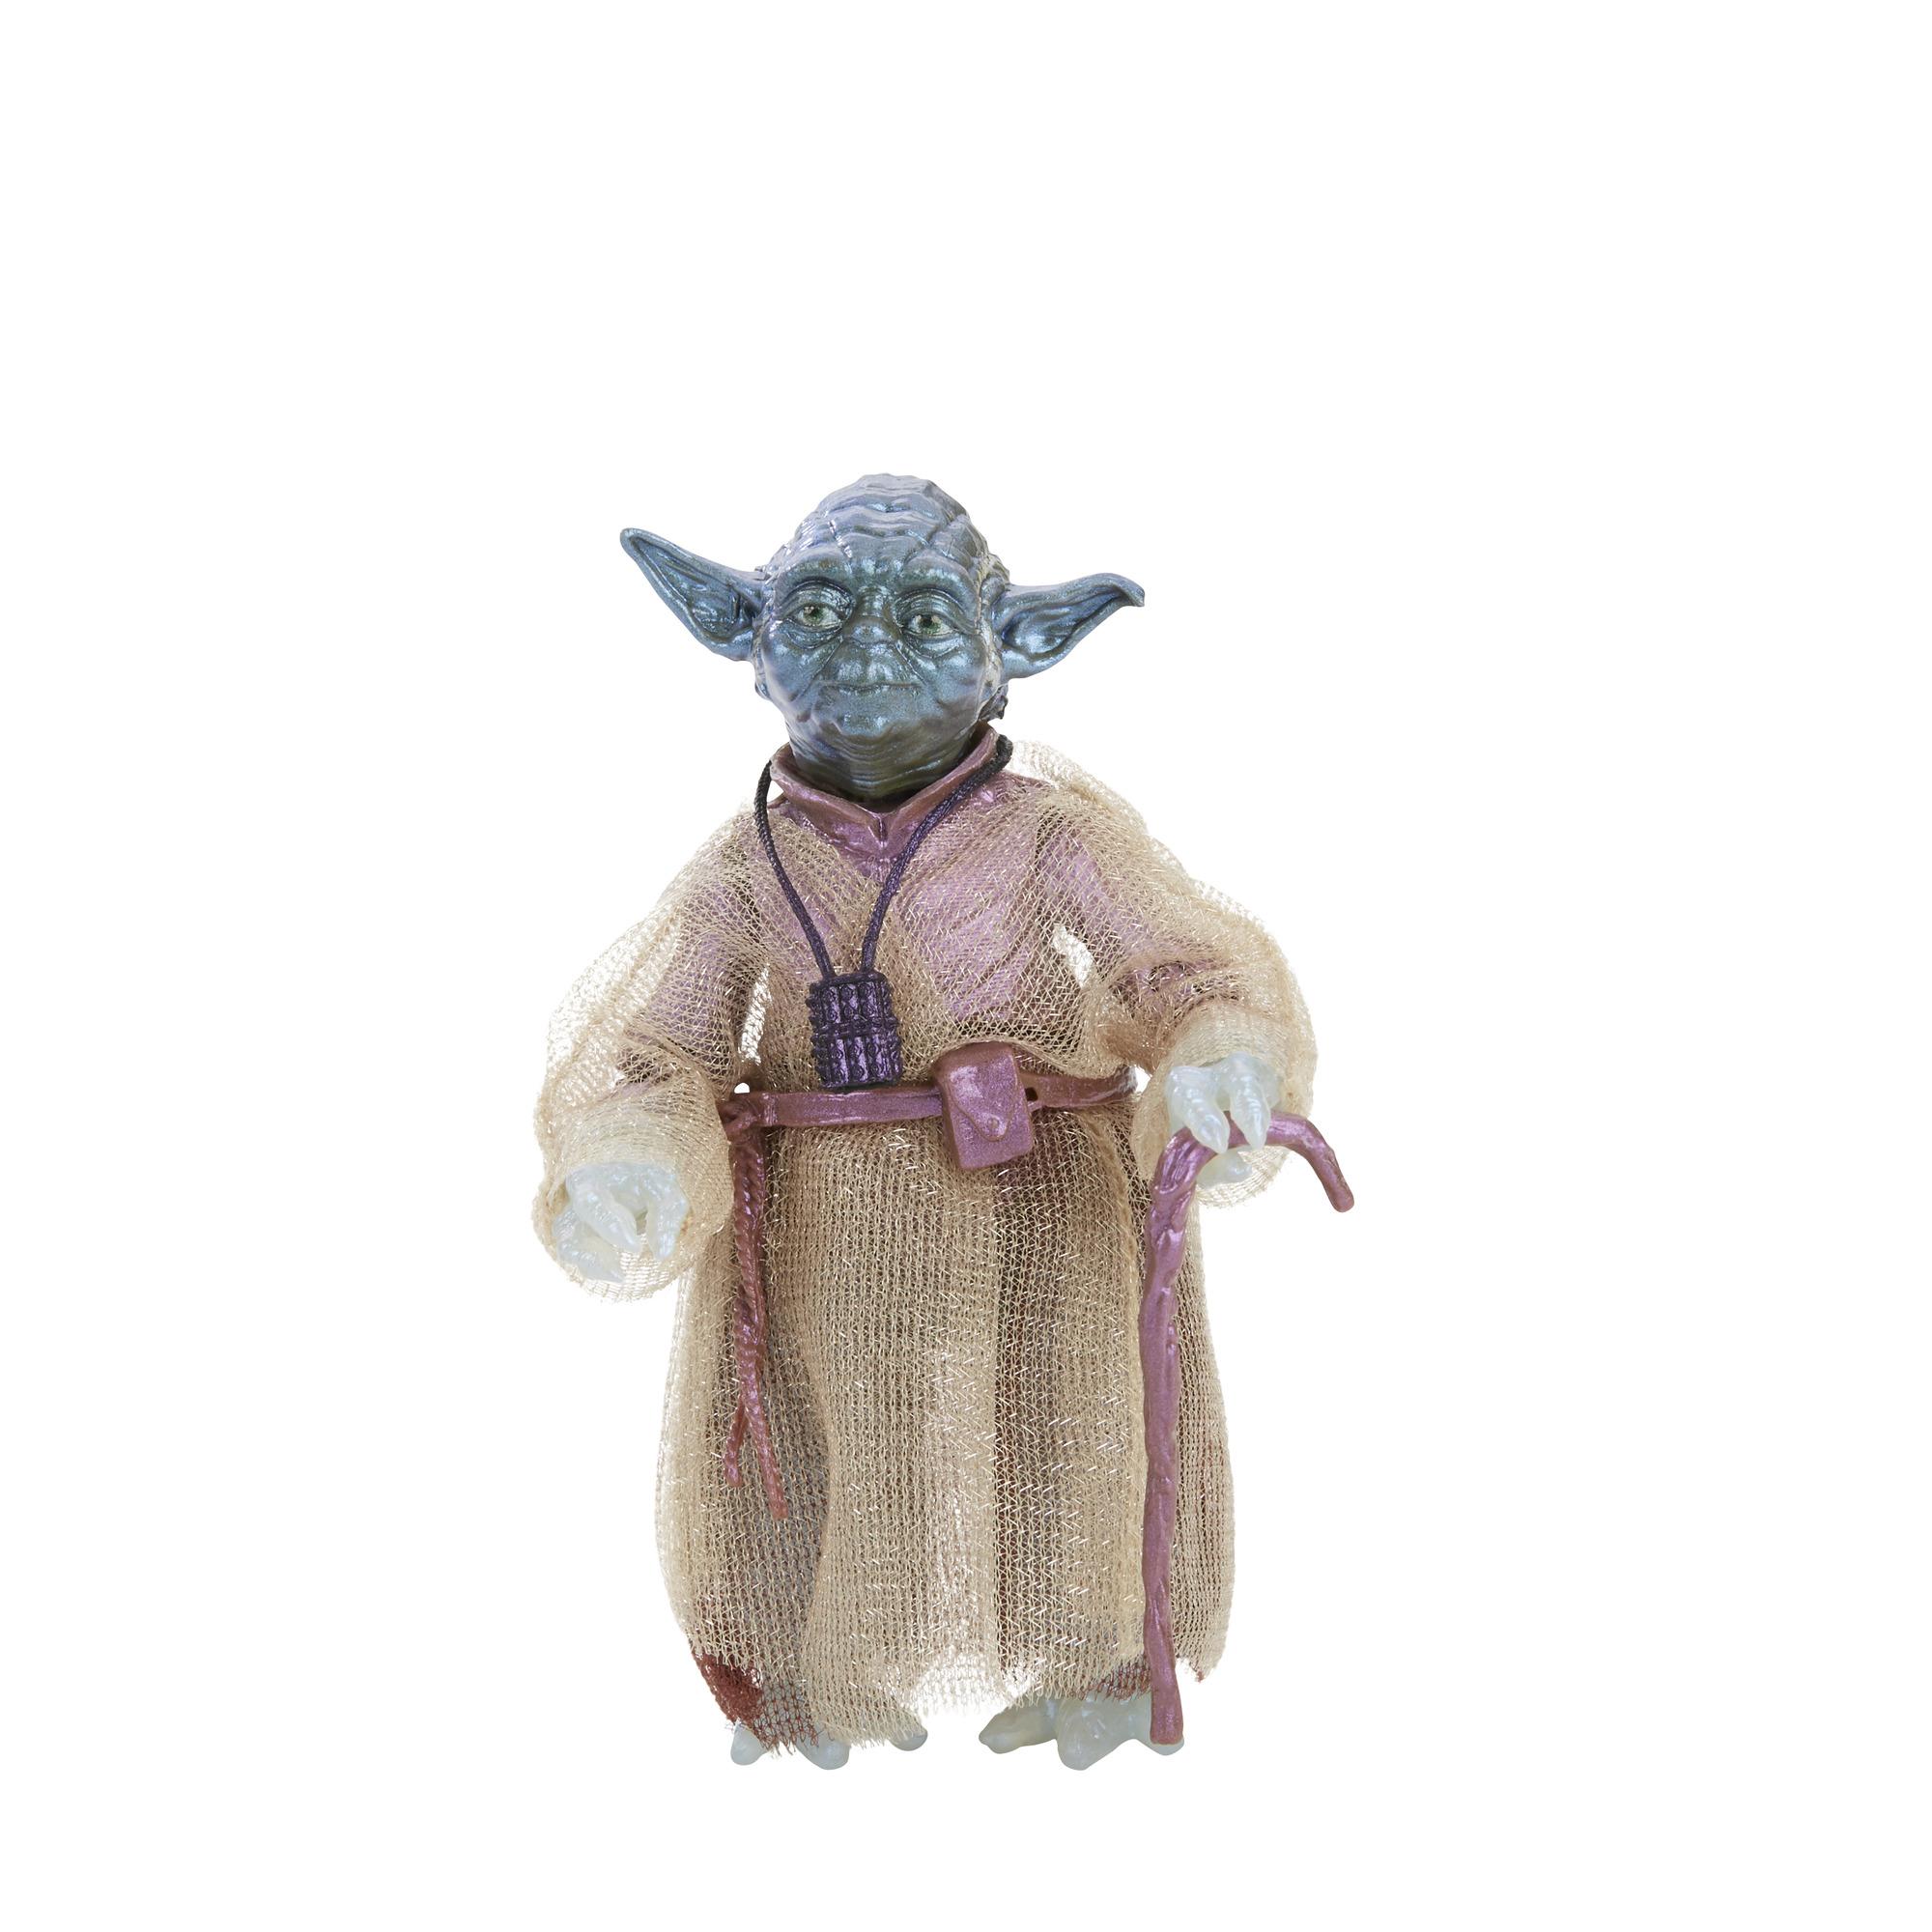 "Star Wars SAGA Series Jedi Master 2.0/"" Yoda hasbro figure collect toy kid gift"